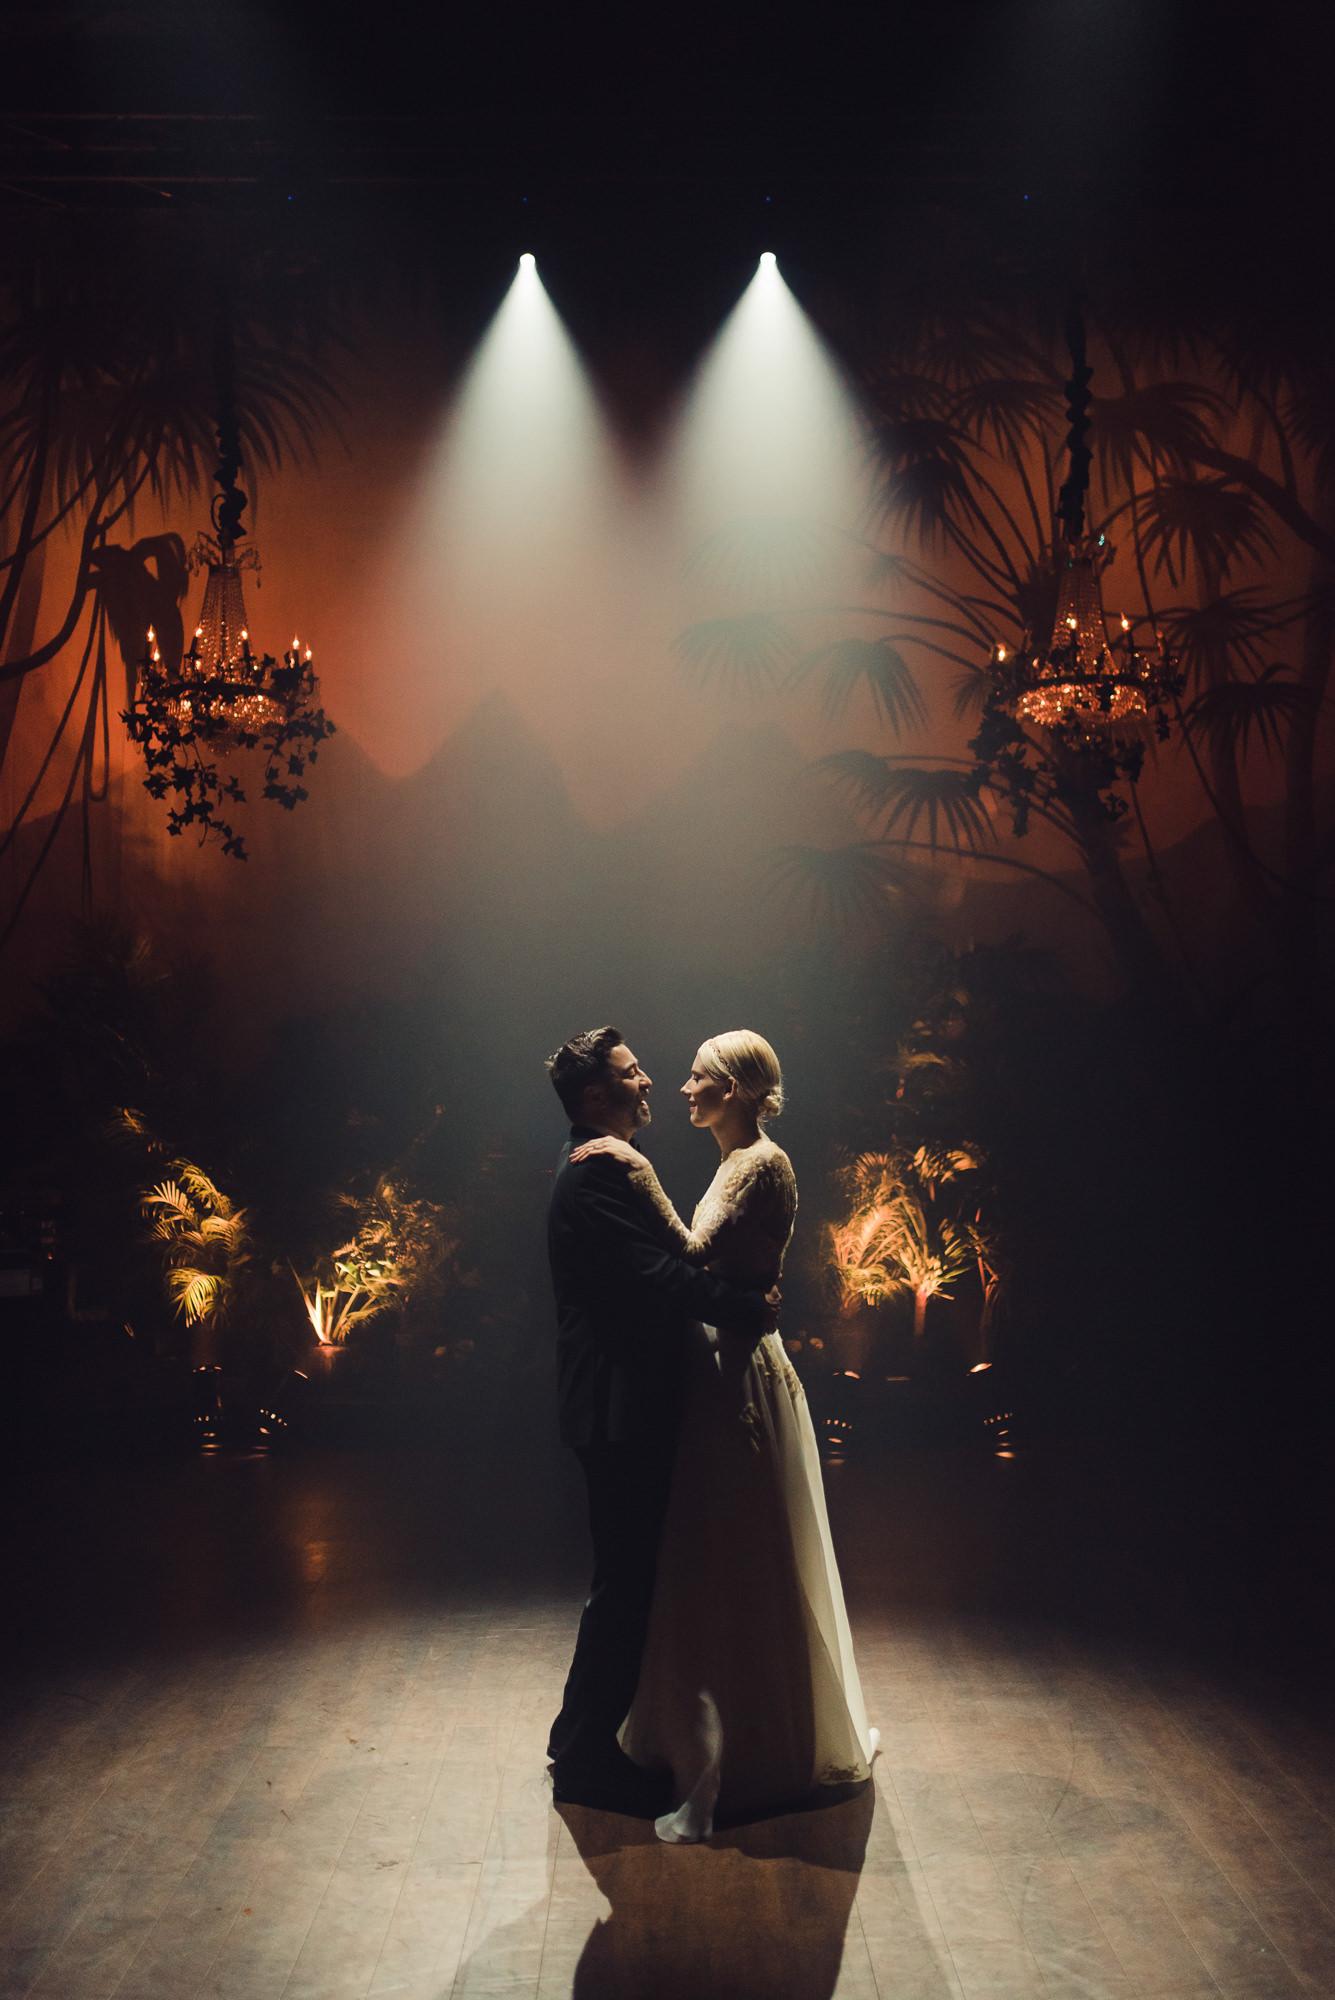 first-dance-in-dual-spotlights-worlds-best-wedding-photos-nordica-sweden-wedding-photographers